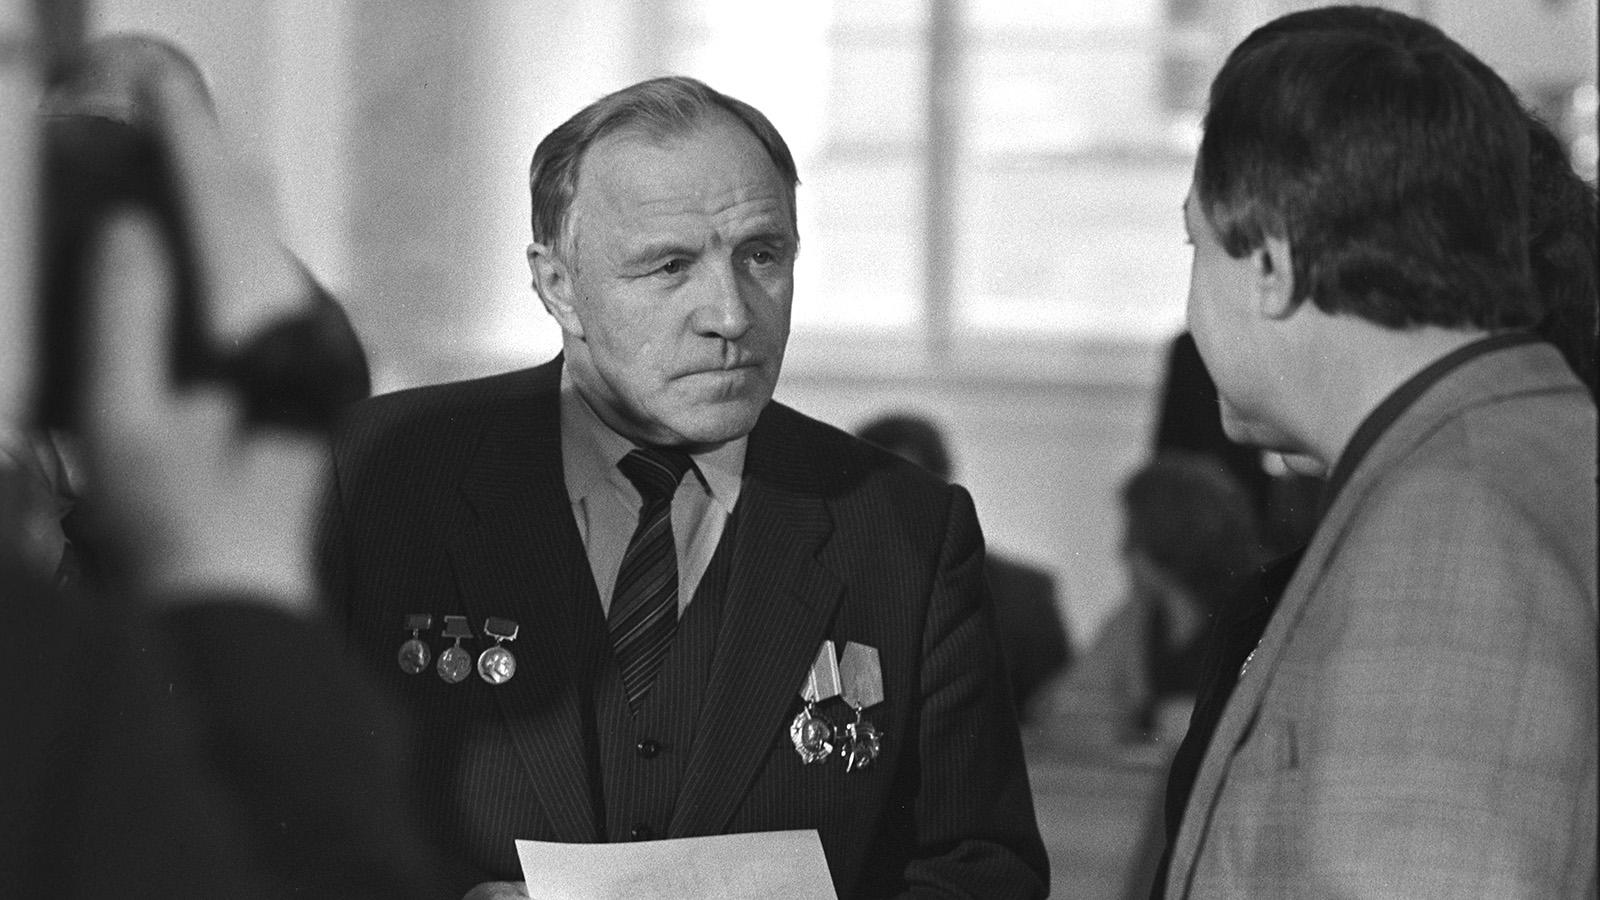 Актер Михаил Ульянов. Москва, XXVII съезд КПСС. Фото: архив